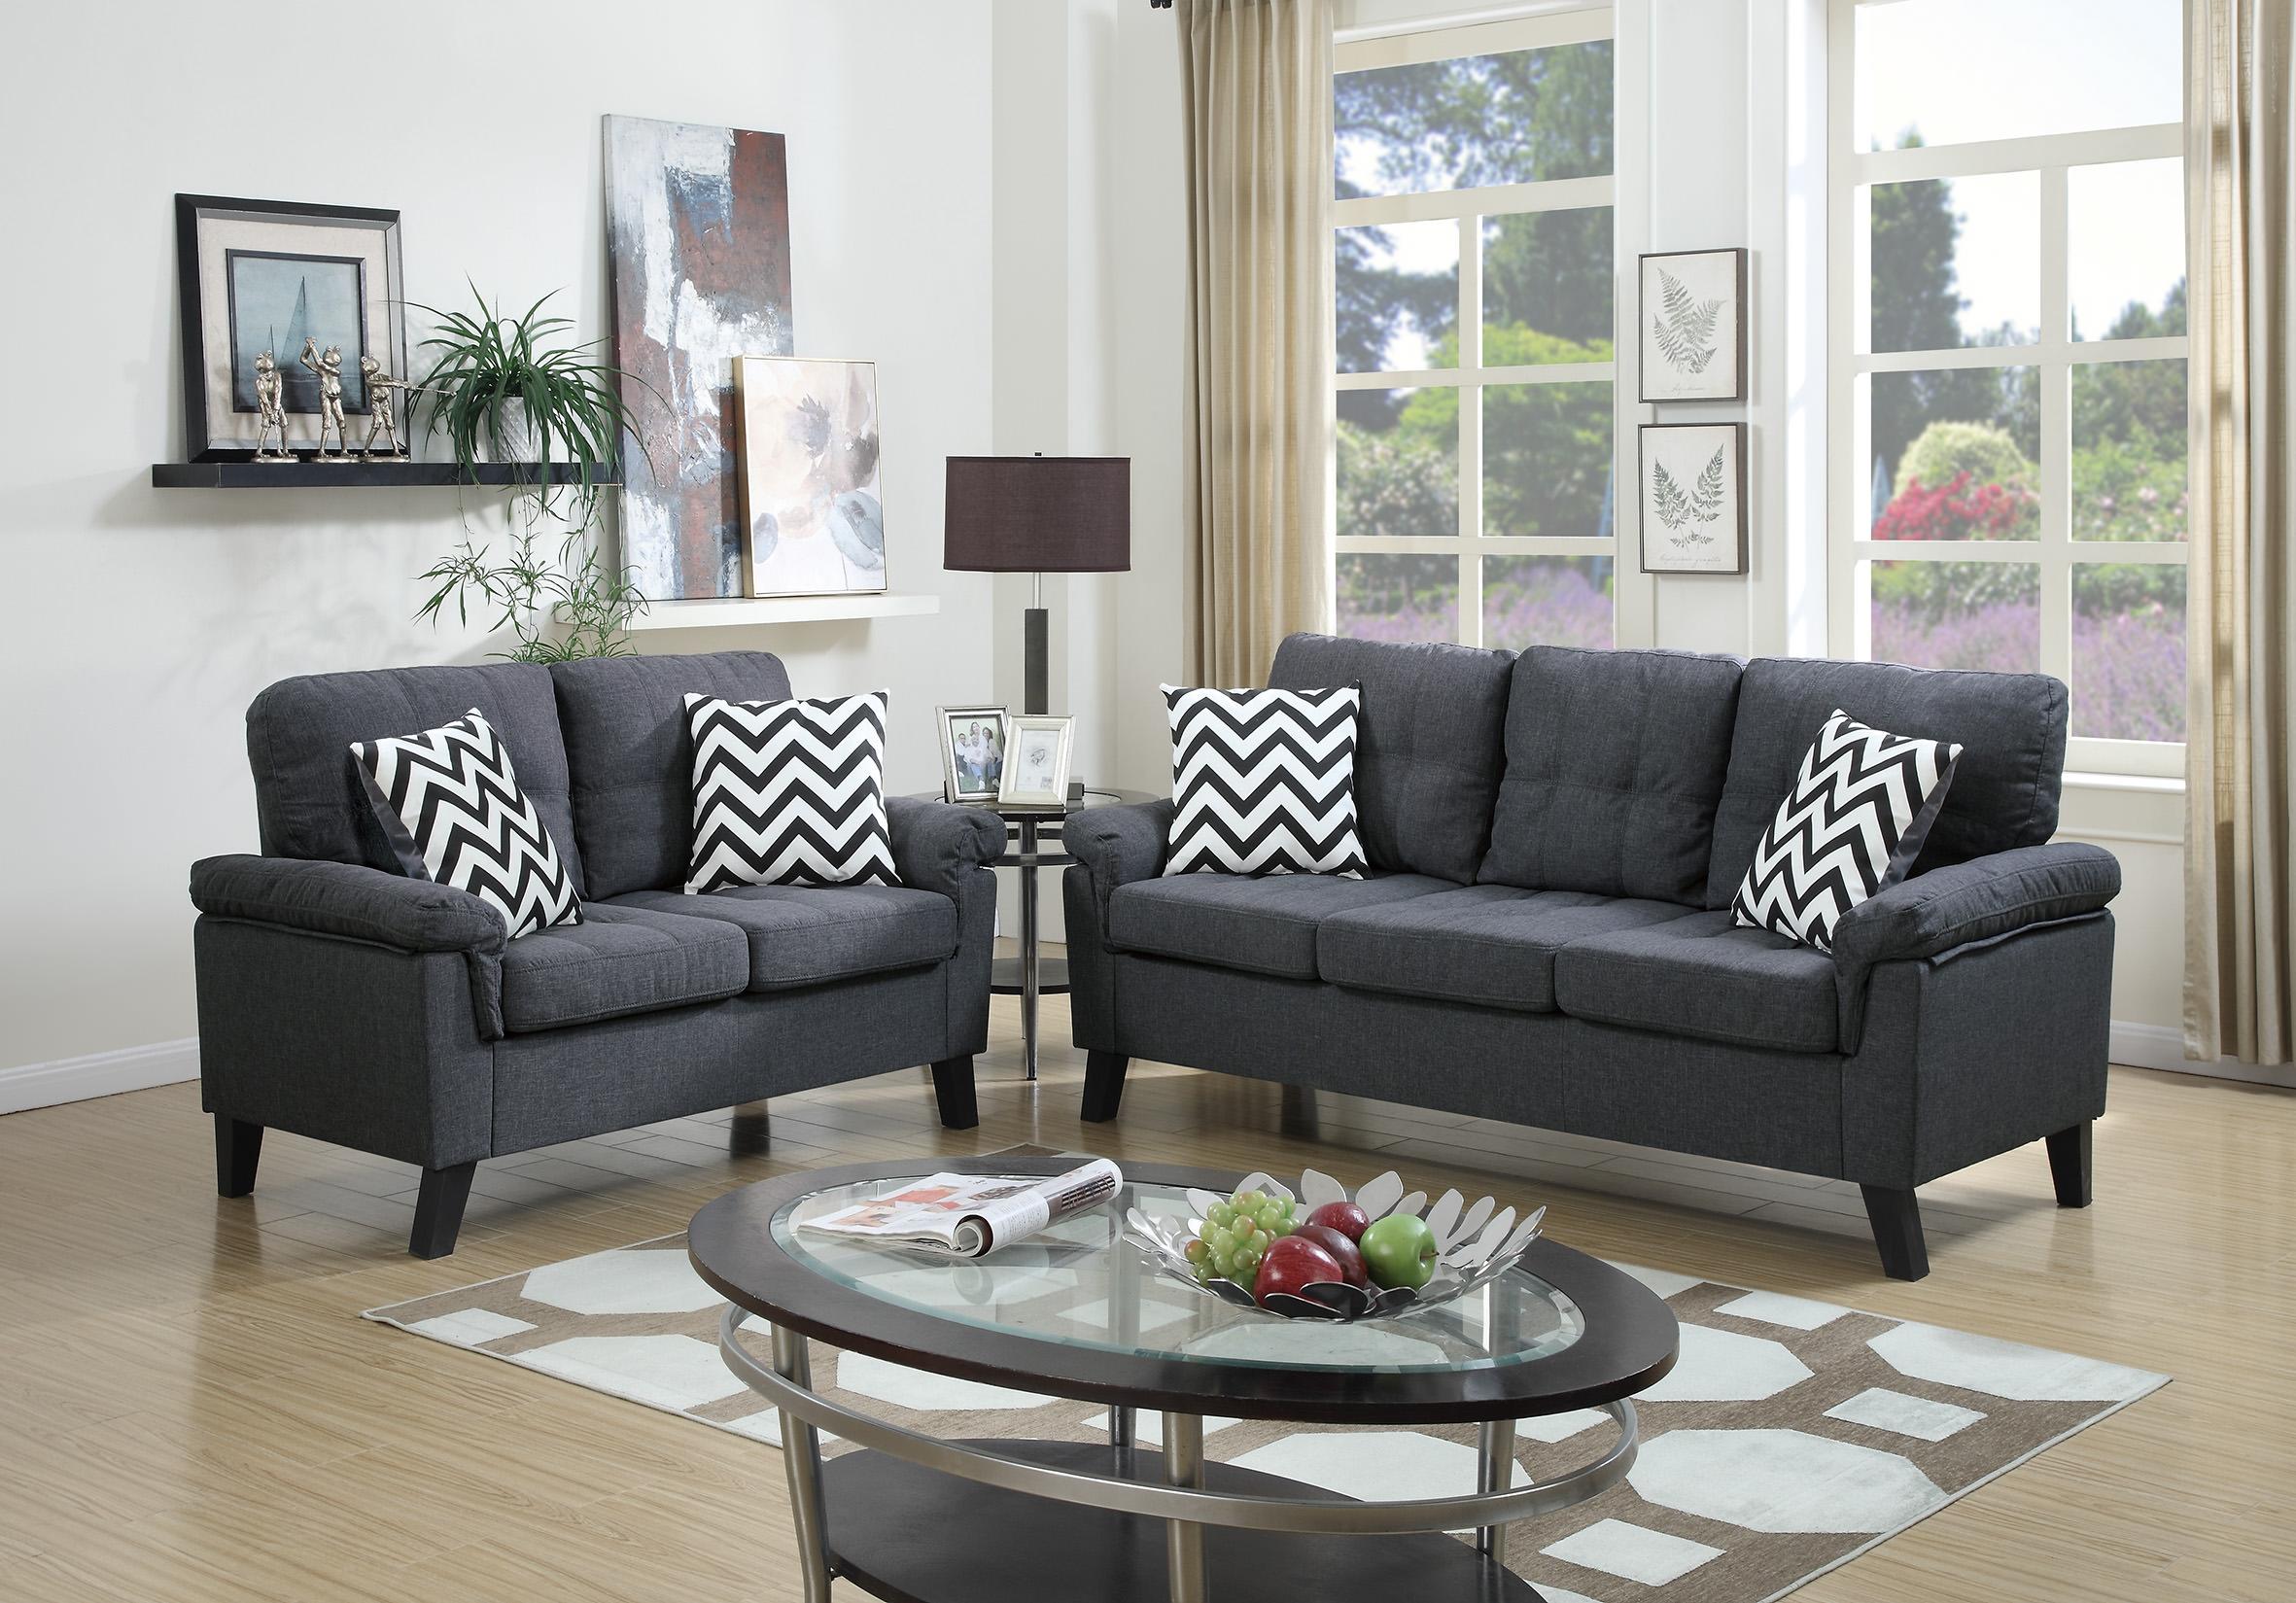 Strange Poundex 2 Pcs Sofa Set Catosfera Net Creativecarmelina Interior Chair Design Creativecarmelinacom